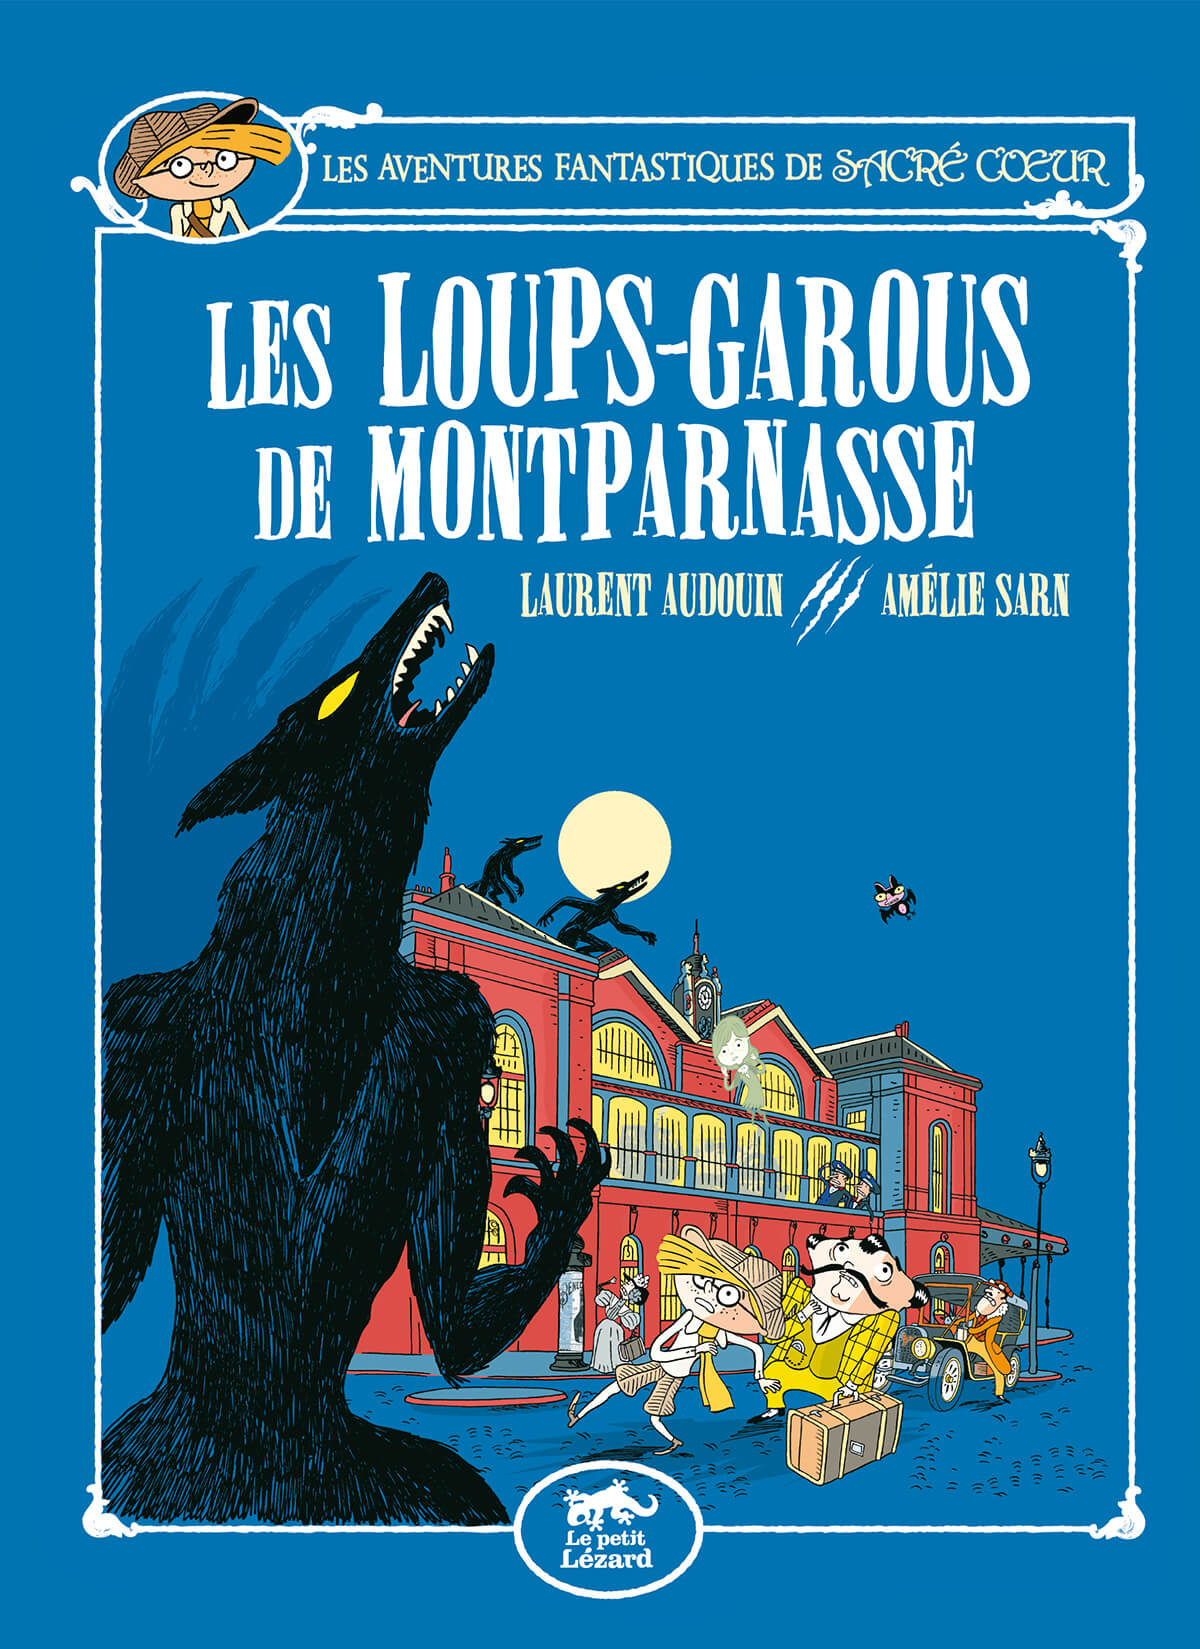 Les loups-garous de Montparnasse